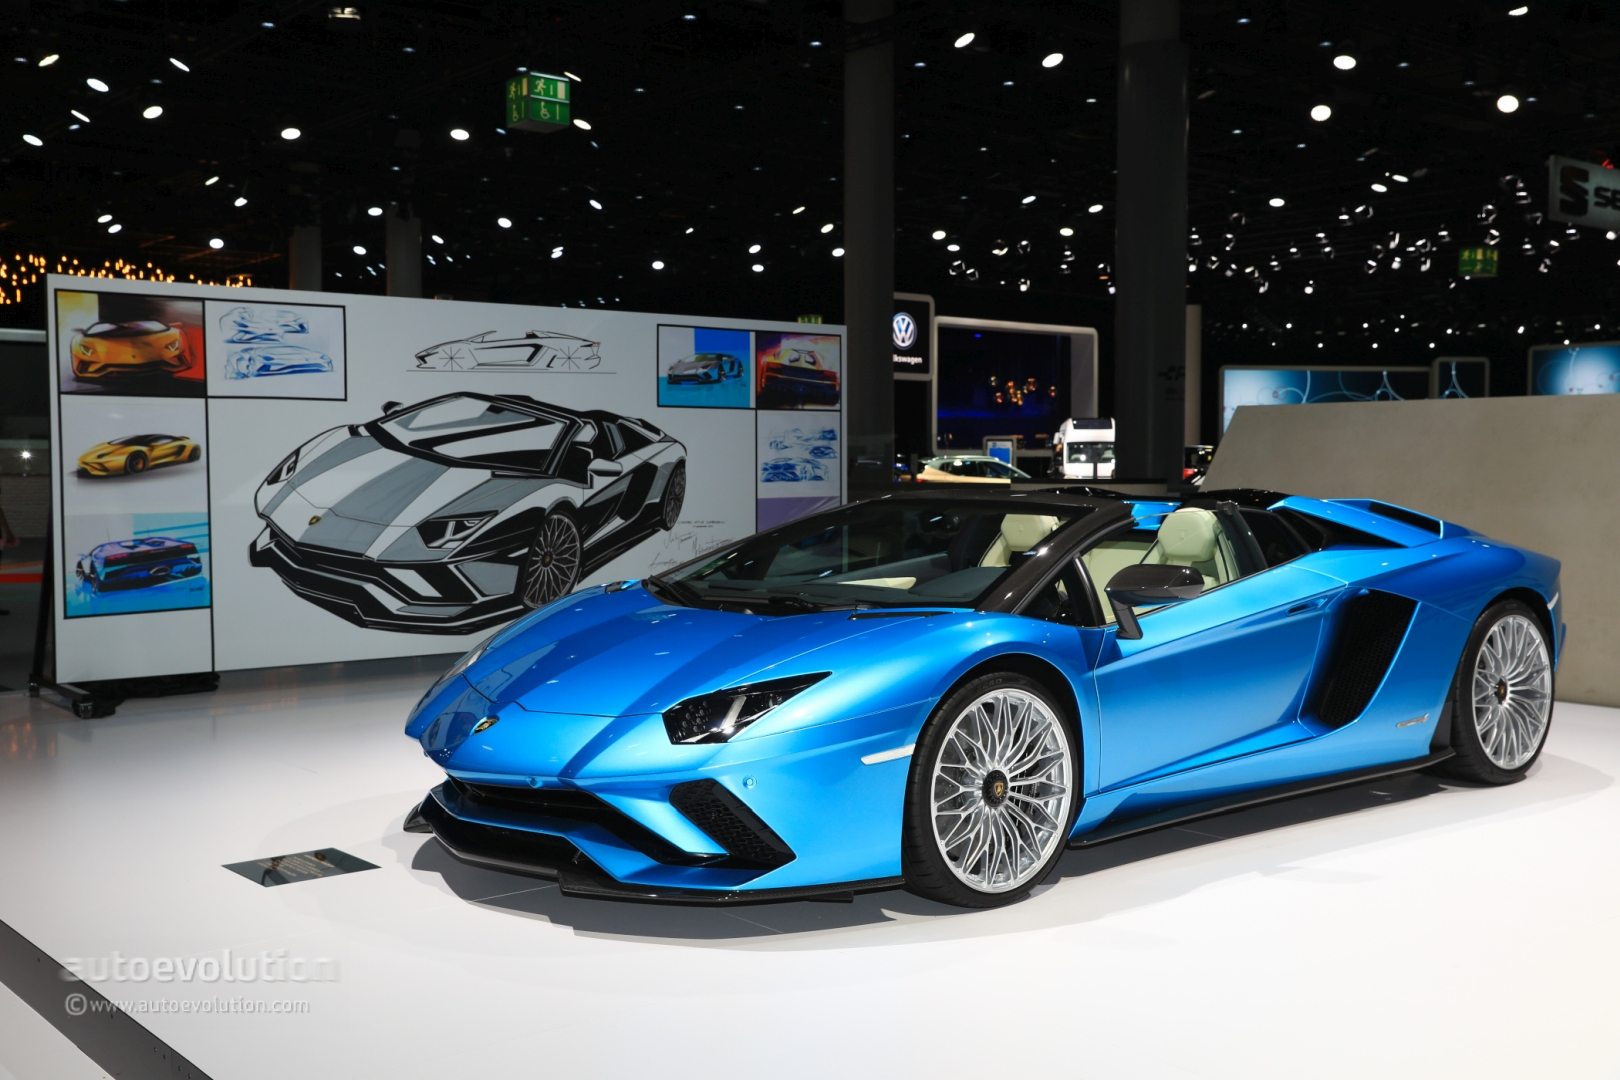 lamborghini aventador s roadster parades blu aegir color in frankfurt autoevolution. Black Bedroom Furniture Sets. Home Design Ideas